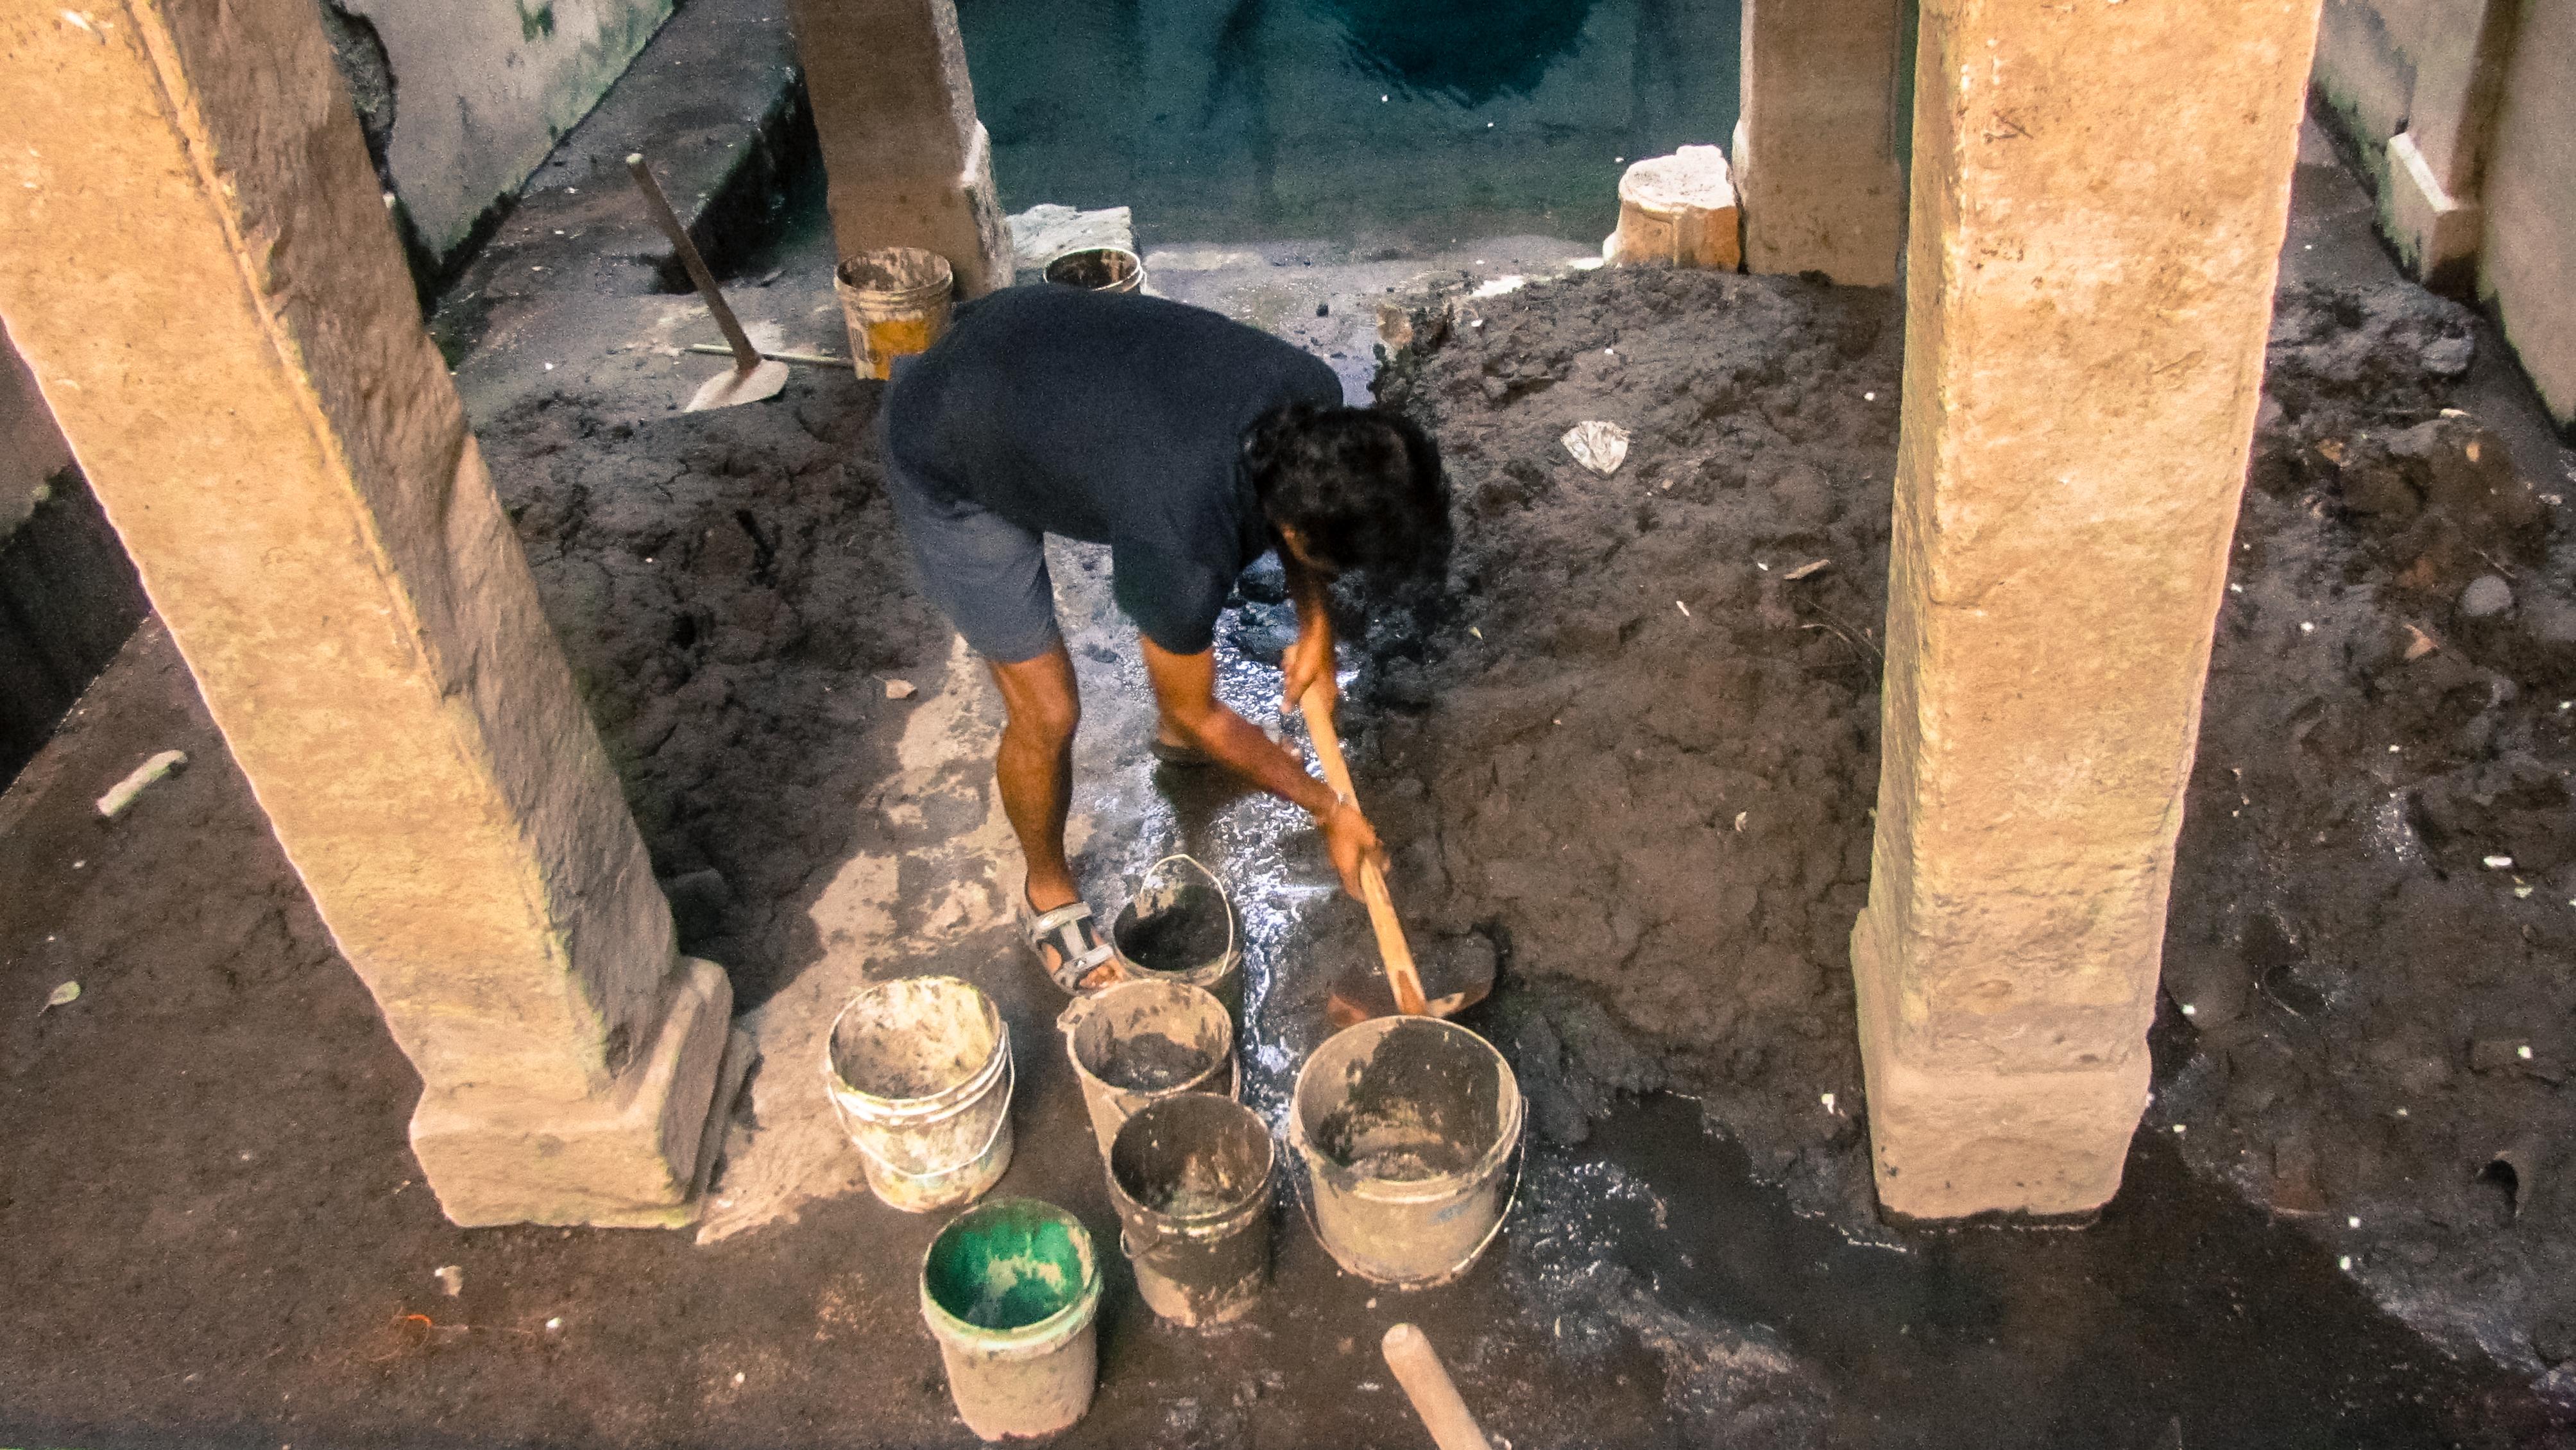 Joshi has cleaned Kriya ka jhalara, Sukhdev Tiwari ji ka jhalara and Mahila Baag jhalara in the last six months with help from a couple of local volunteers. Nowadays, he is cleaning the Satyanarain ji ki bawadi